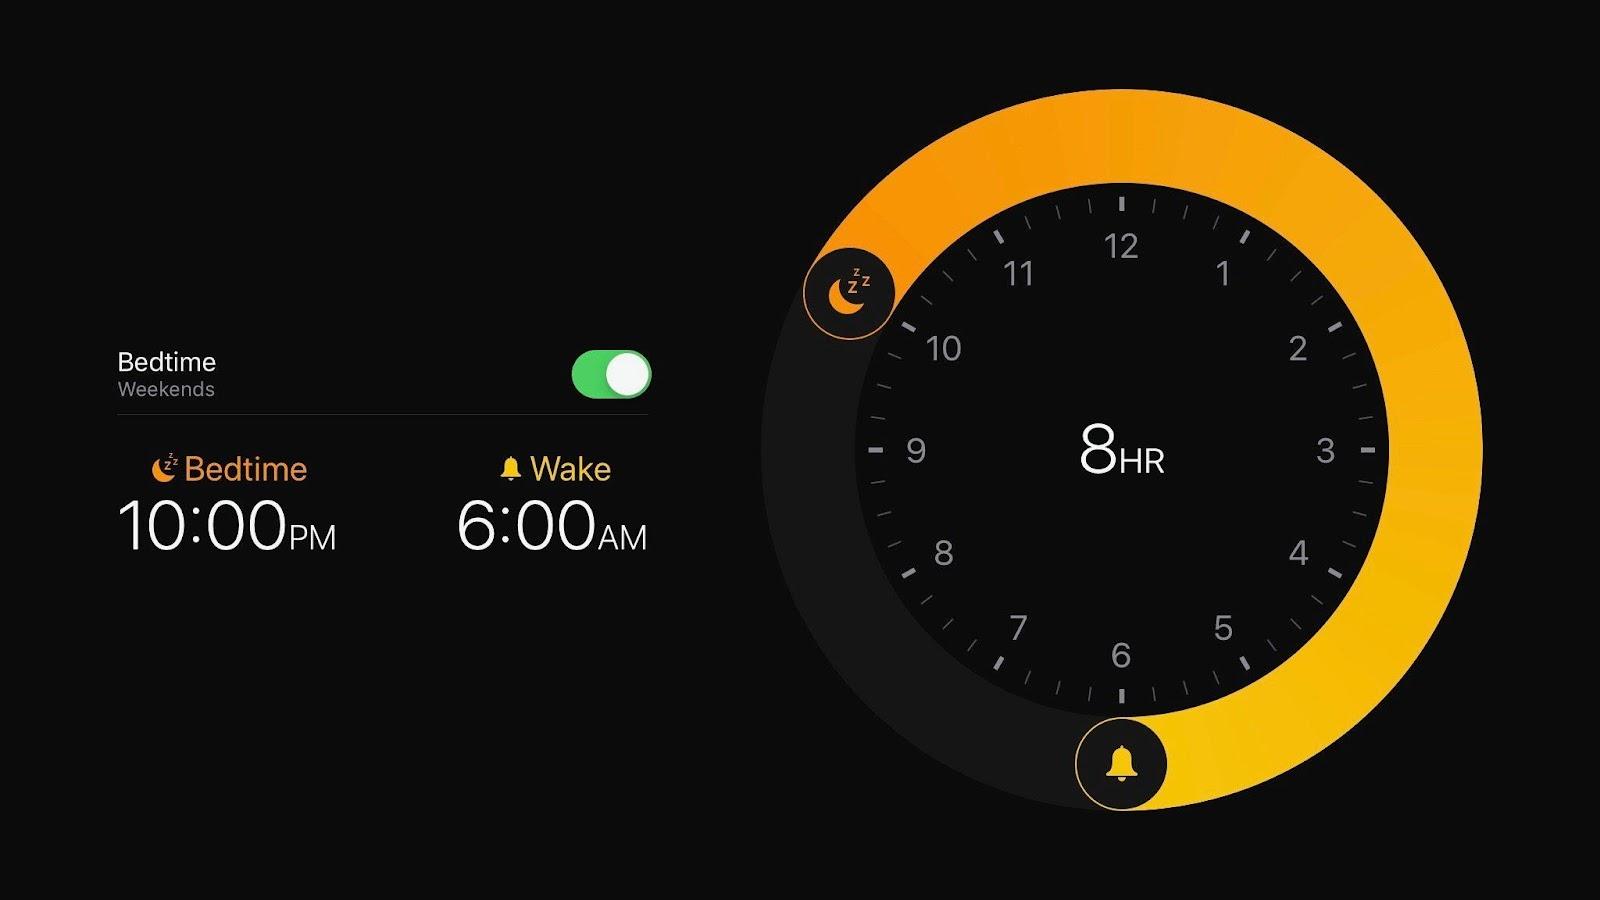 iPhone & iPad: How to setup Bedtime on iOS and get more sleep - 9to5Mac